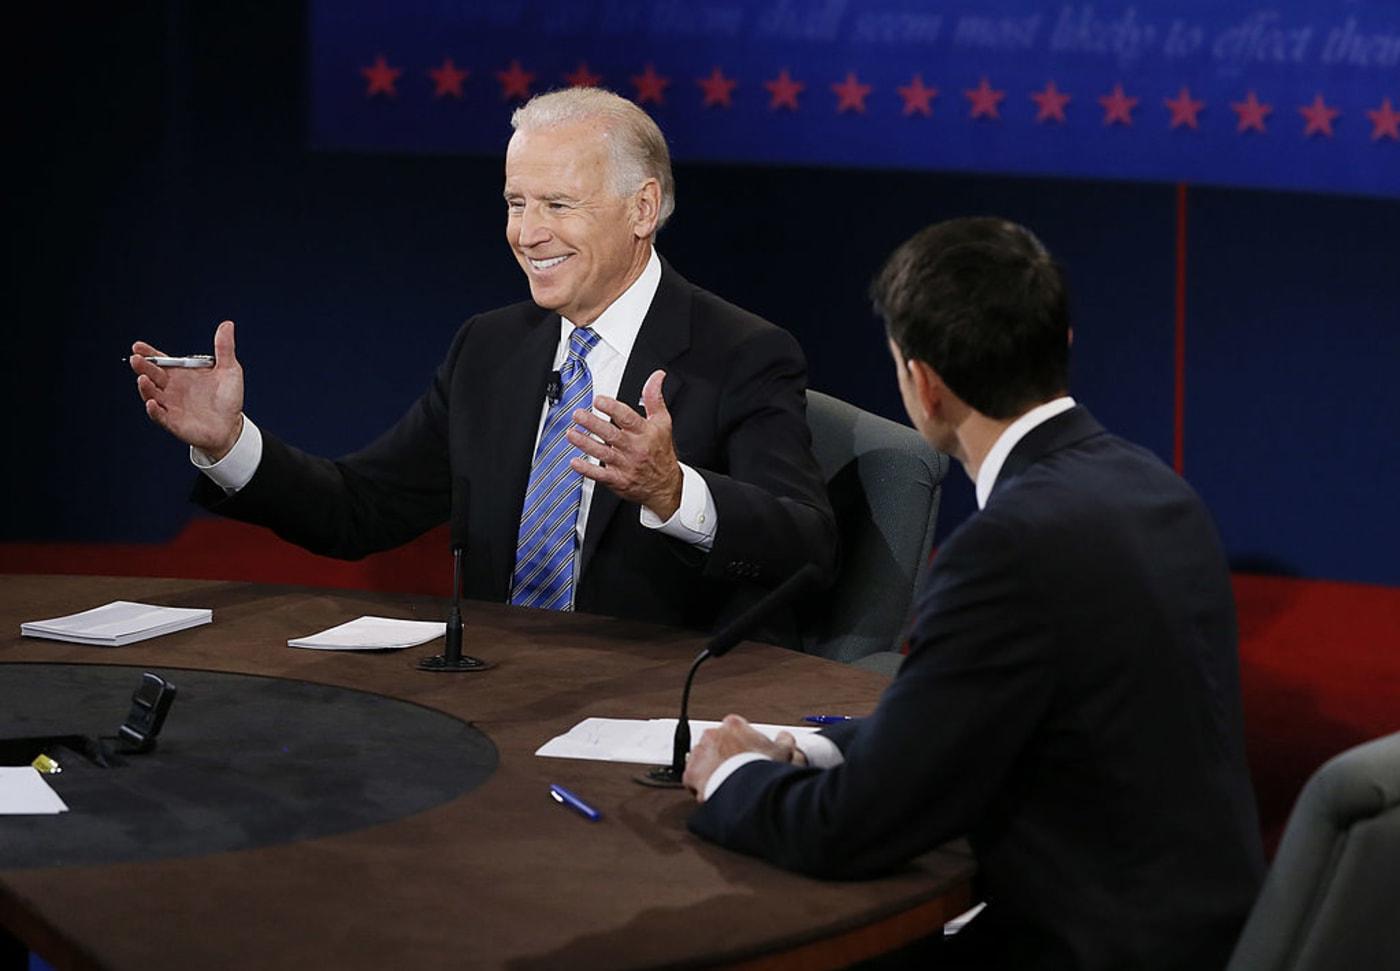 biden debate 2012